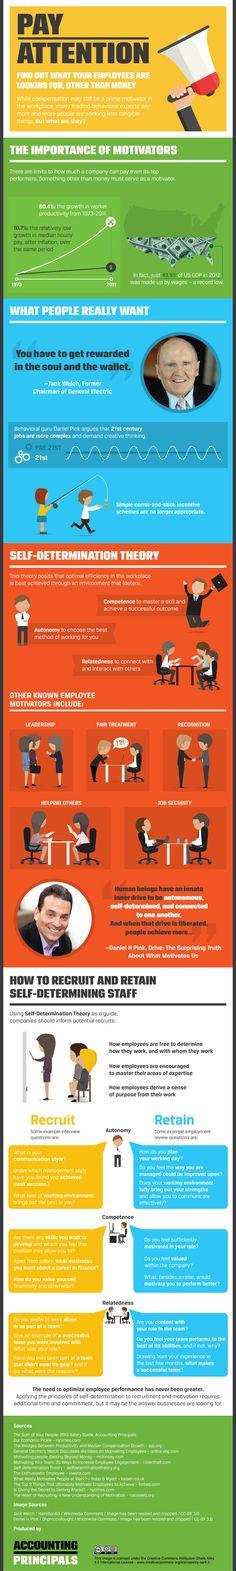 The Best Non-Financial Employee Motivators (Infographic)